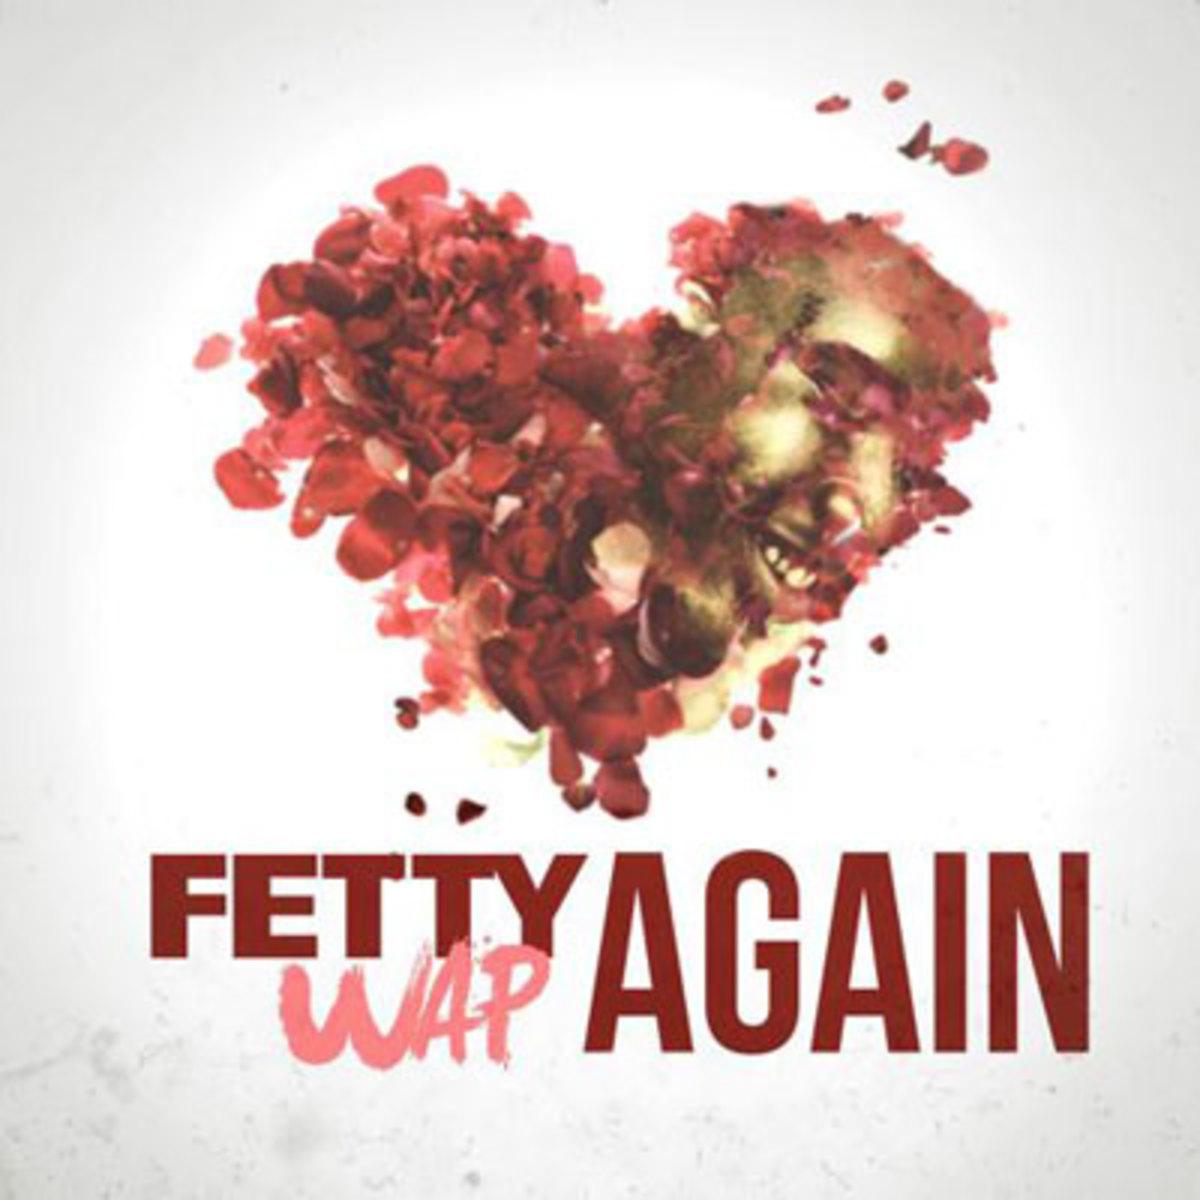 fetty-wap-again.jpg